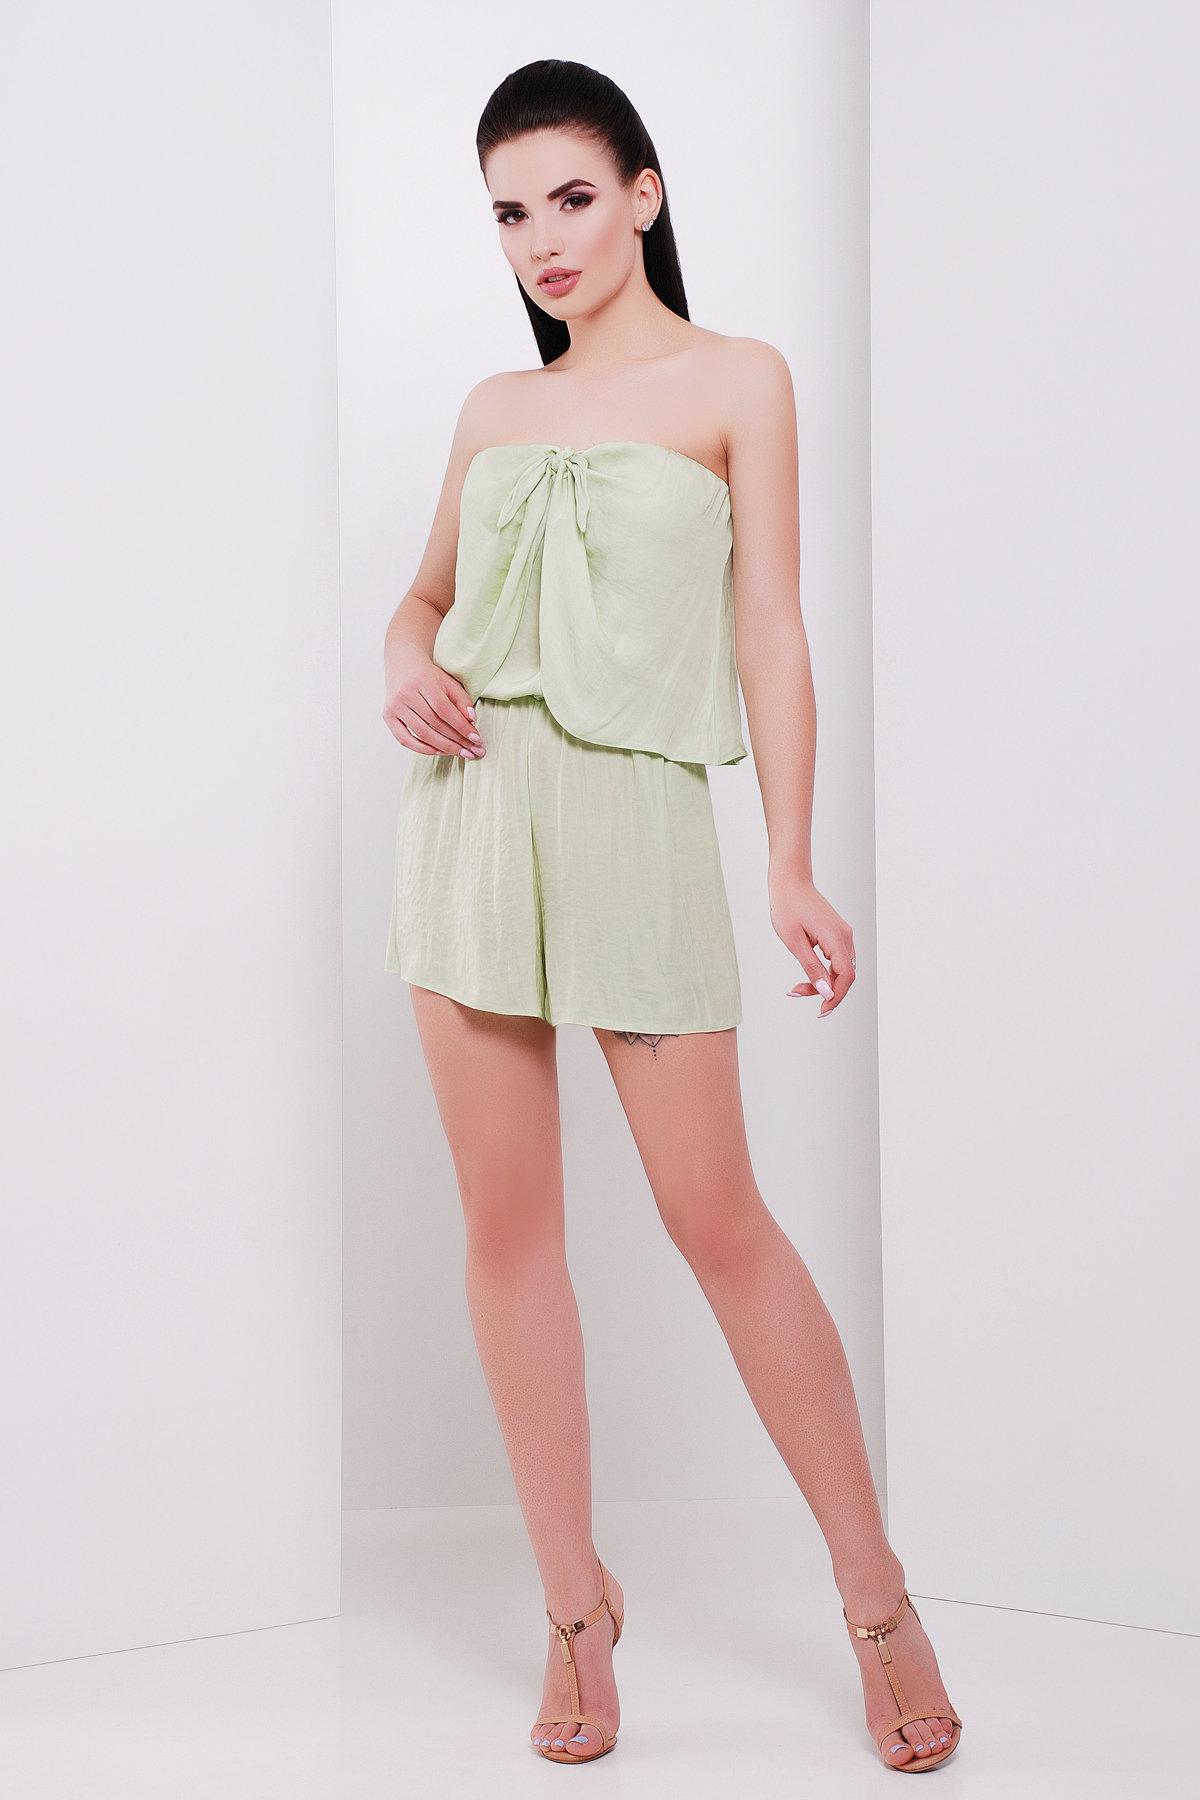 Купить комбинезон женский модный Комбинезон Наоми 3125